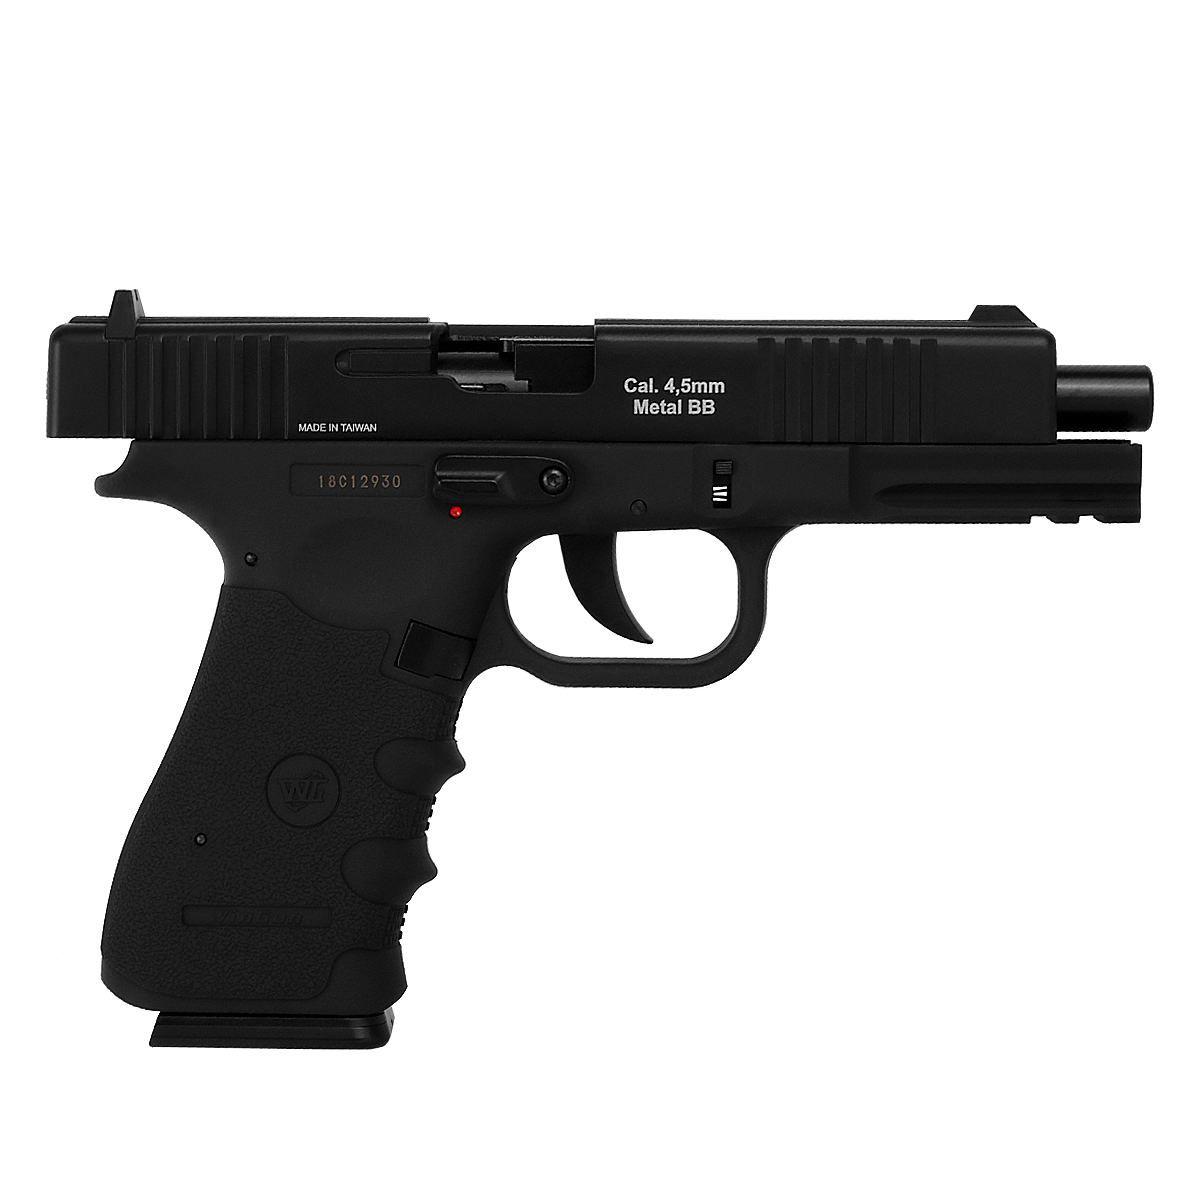 Pistola Airgun Gás Co2 Win Gun Glock W119 Blowback 4,5mm K3